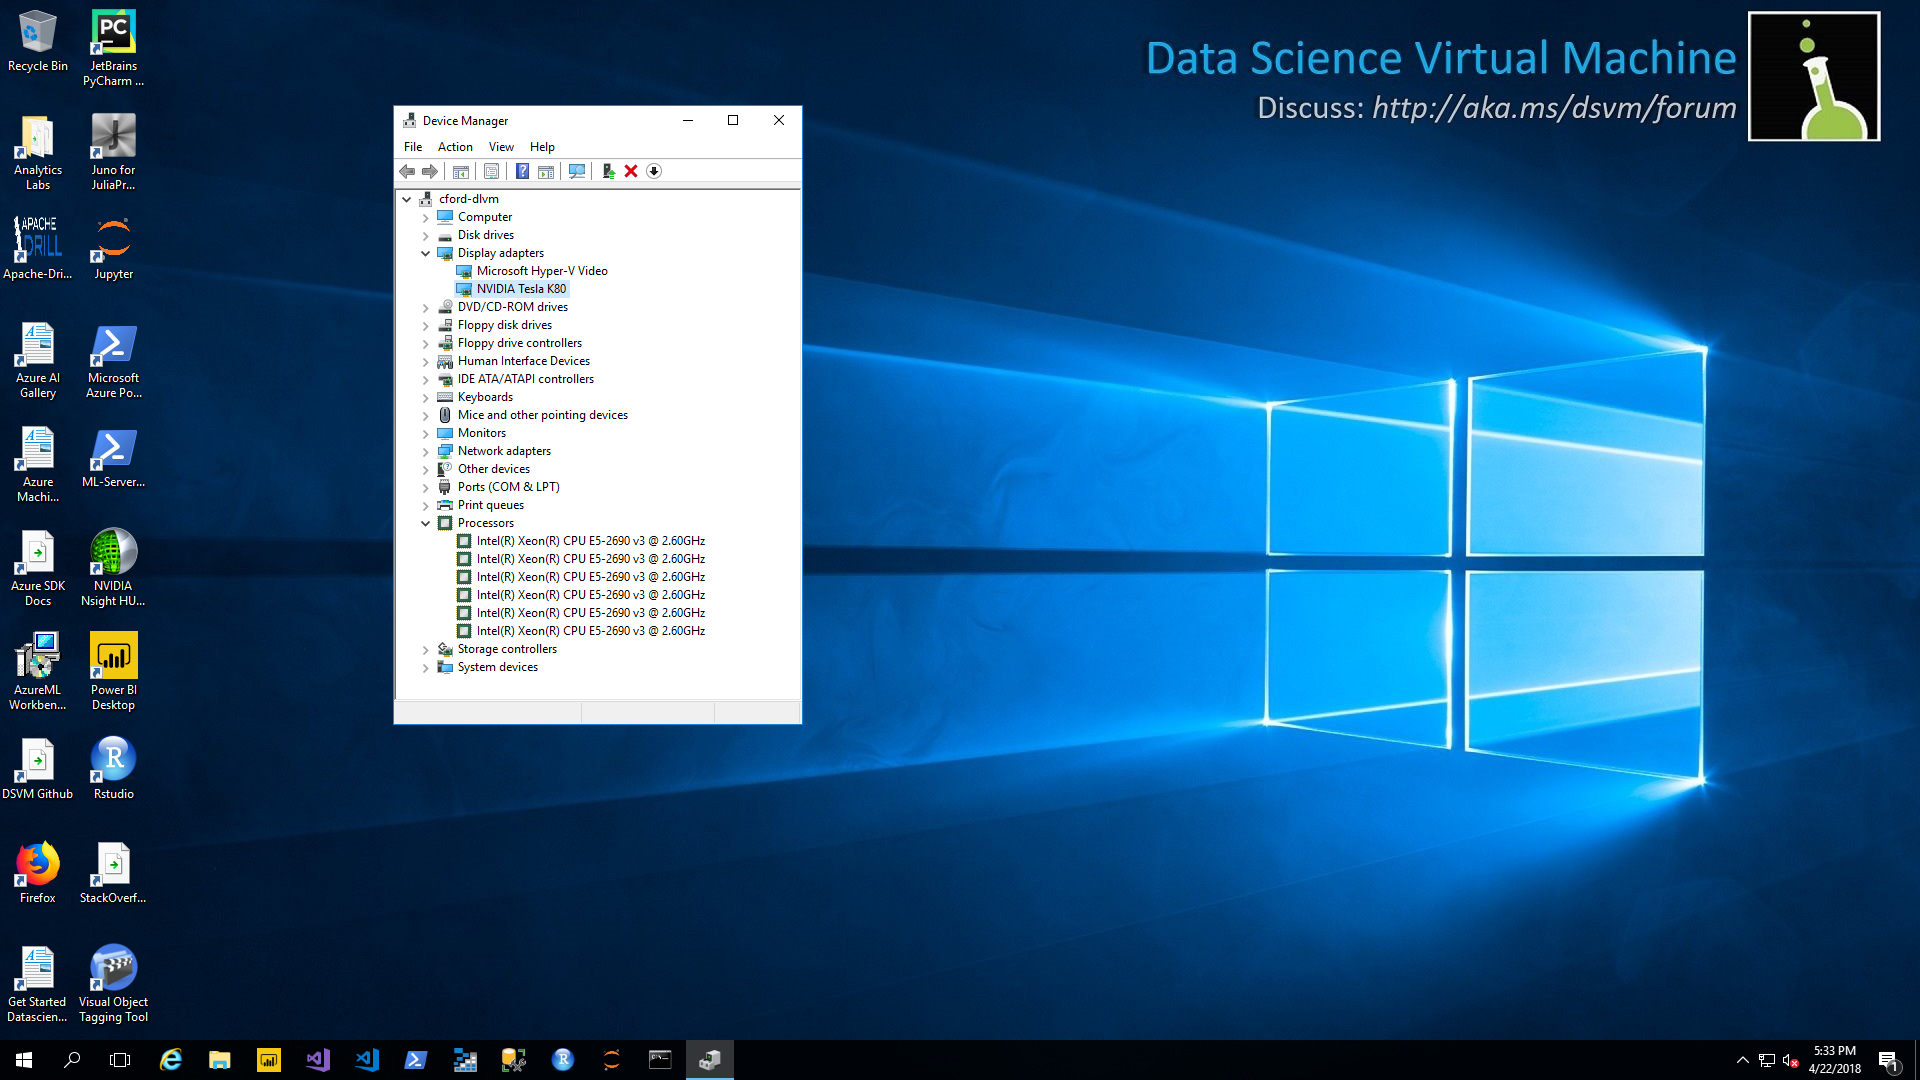 DLVM Desktop